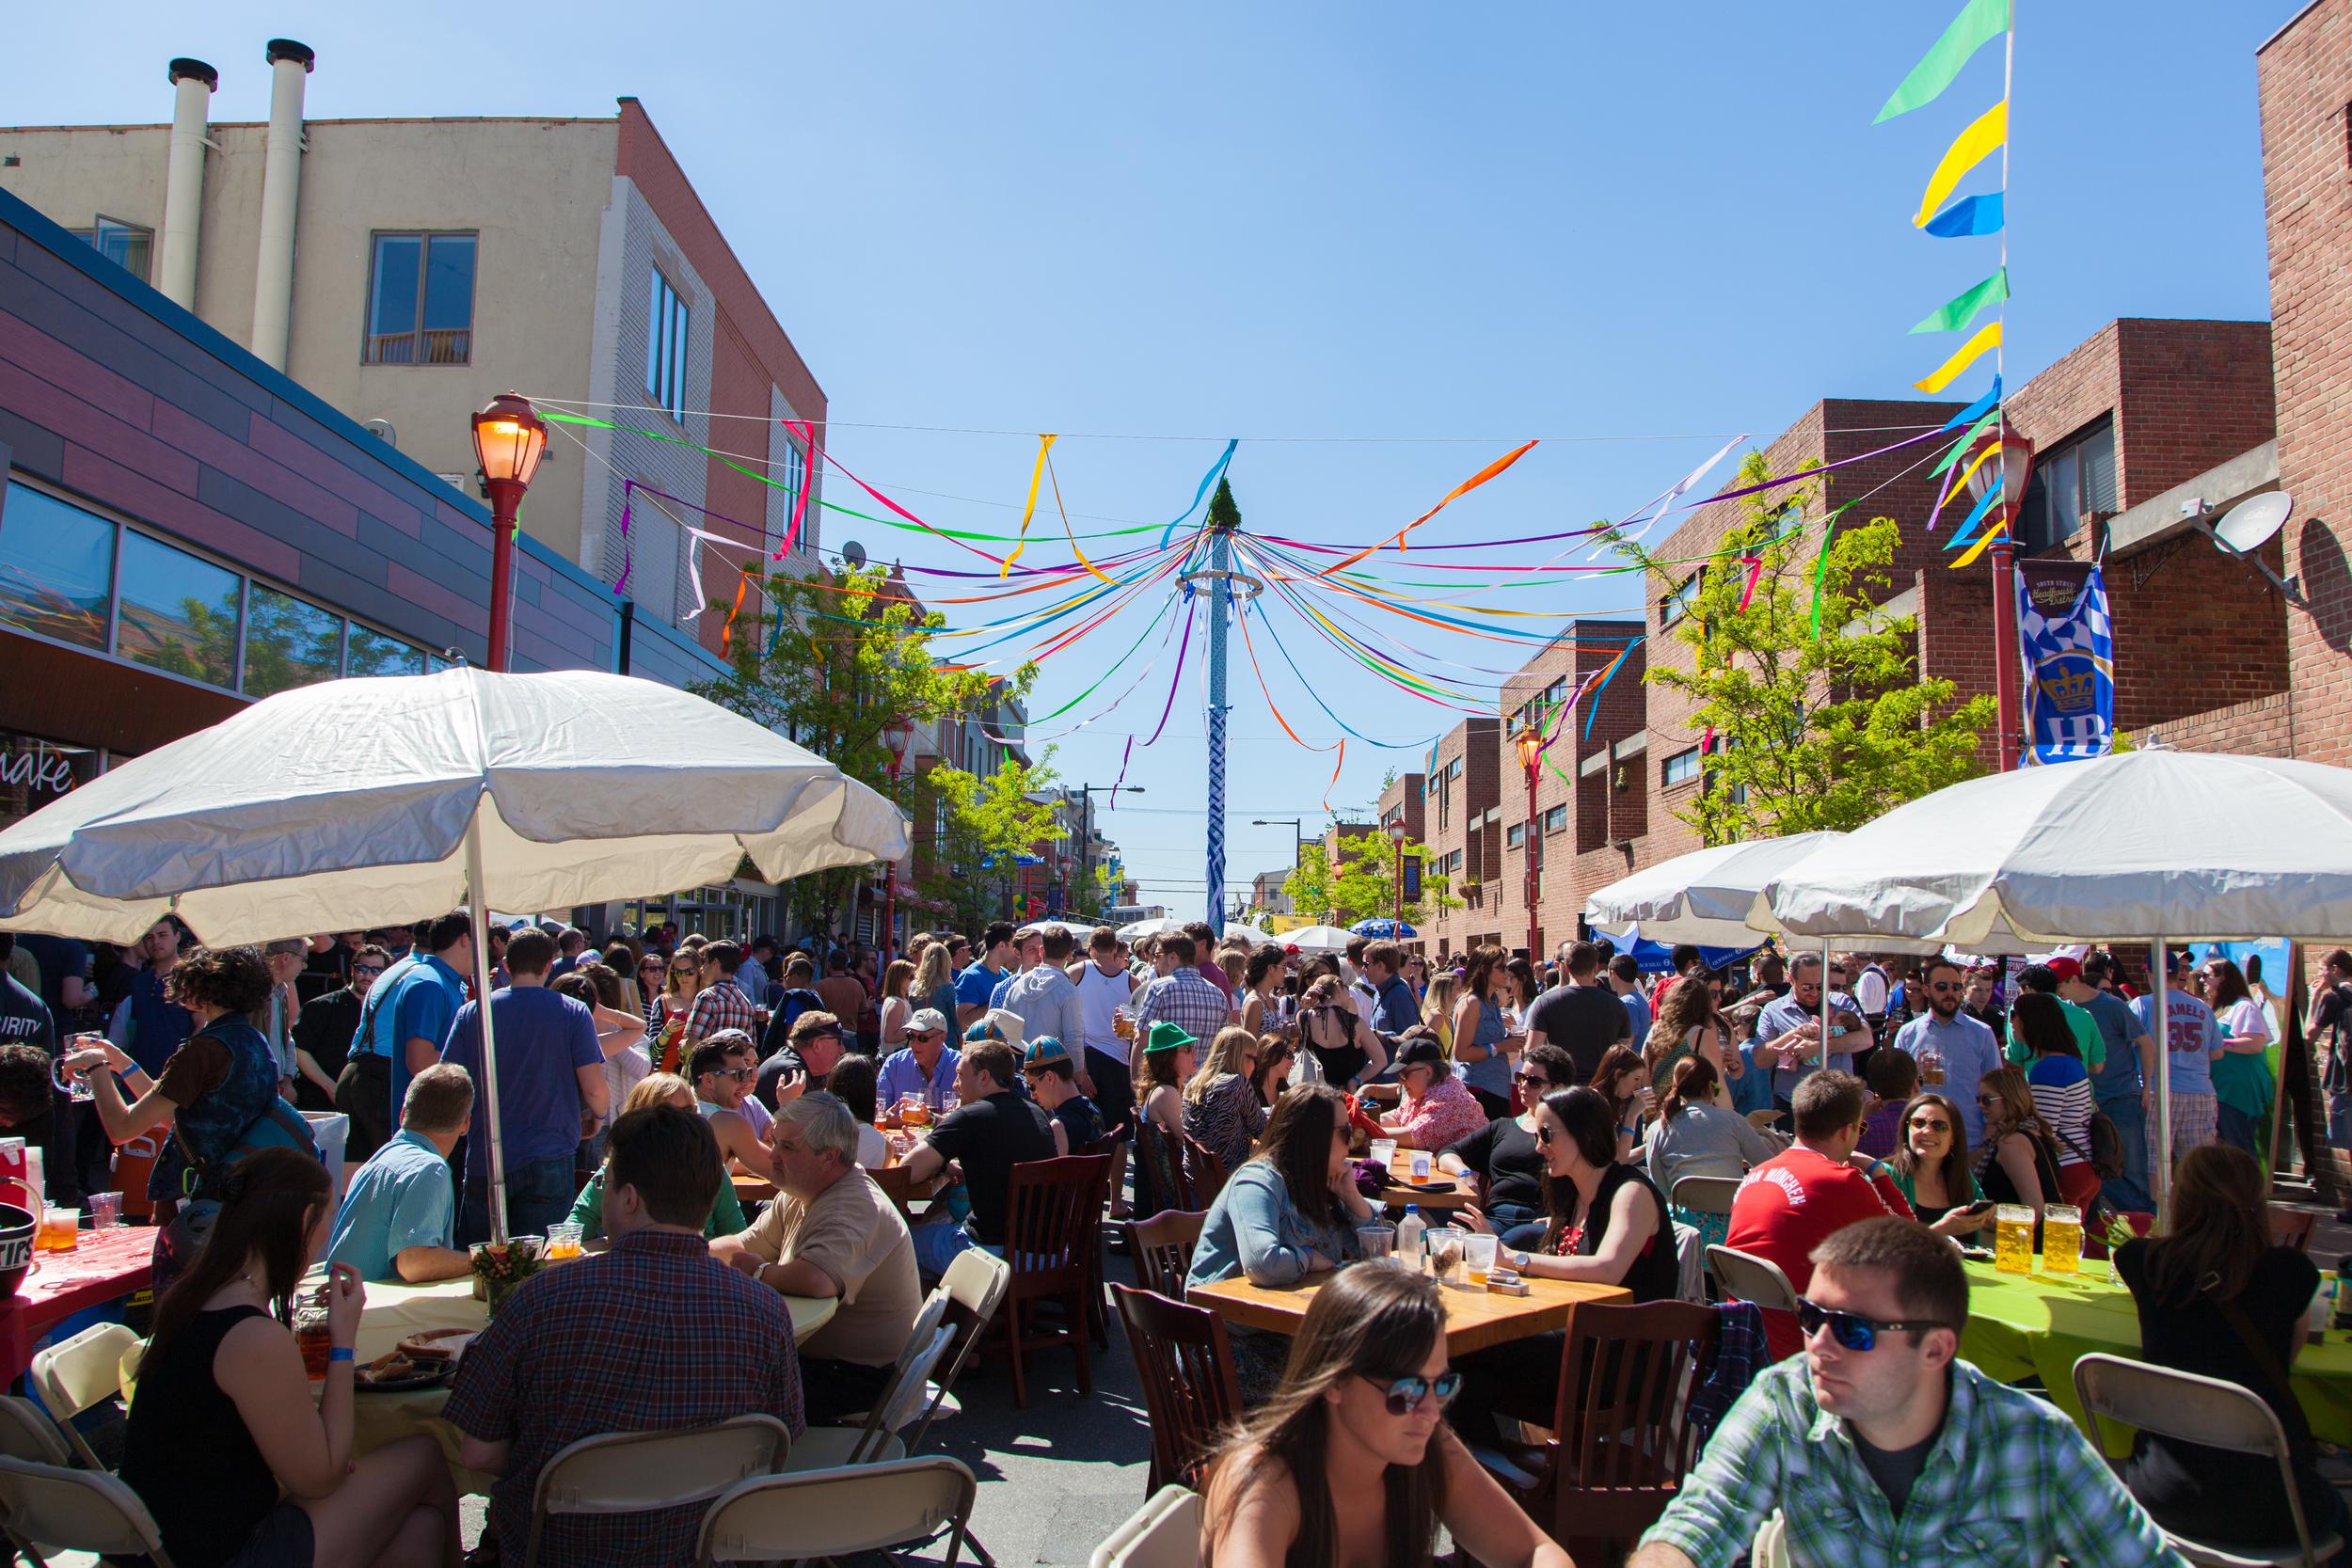 South Street, Spring Festival, Philadelphia, Philadelphia's, Summer Season, Music, Art, Food, Drink, May 2